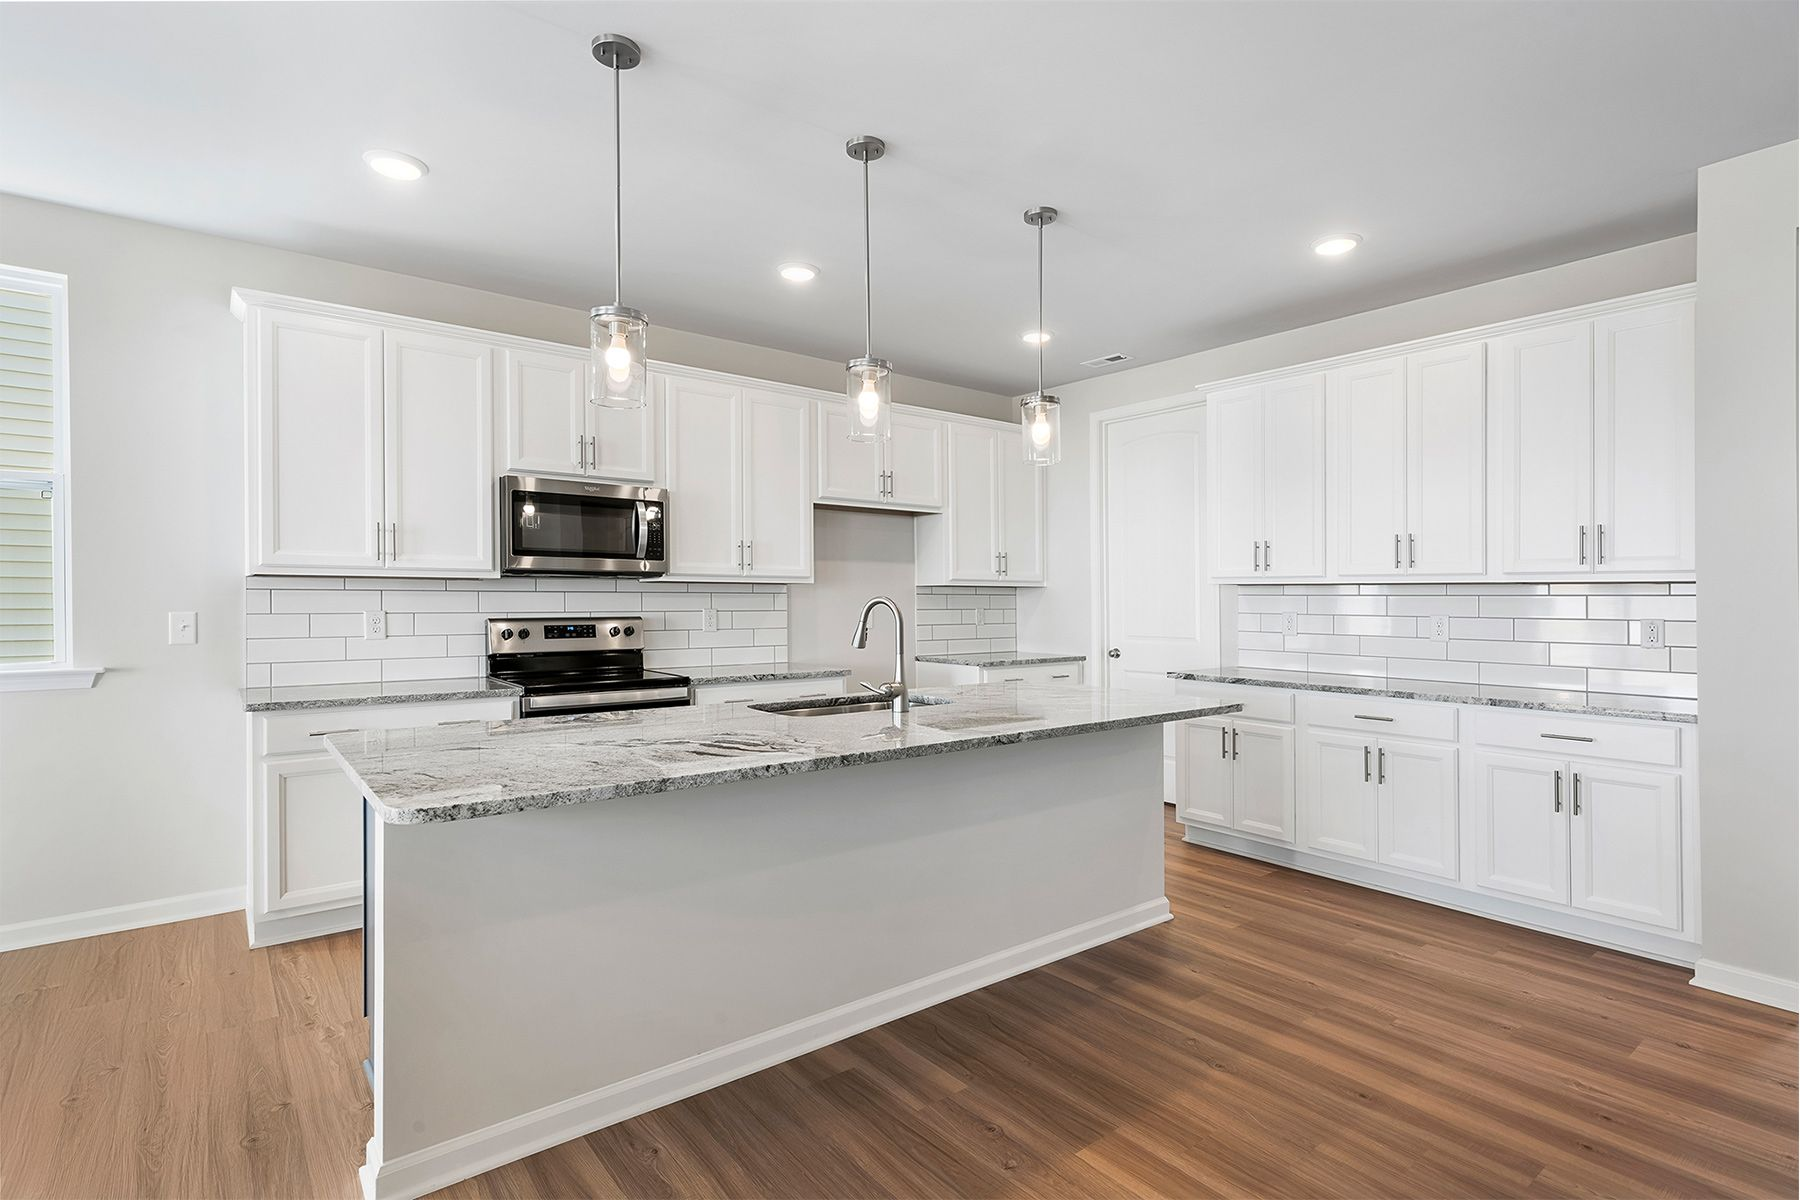 Interior:*Photo representation of Crosby floorplan